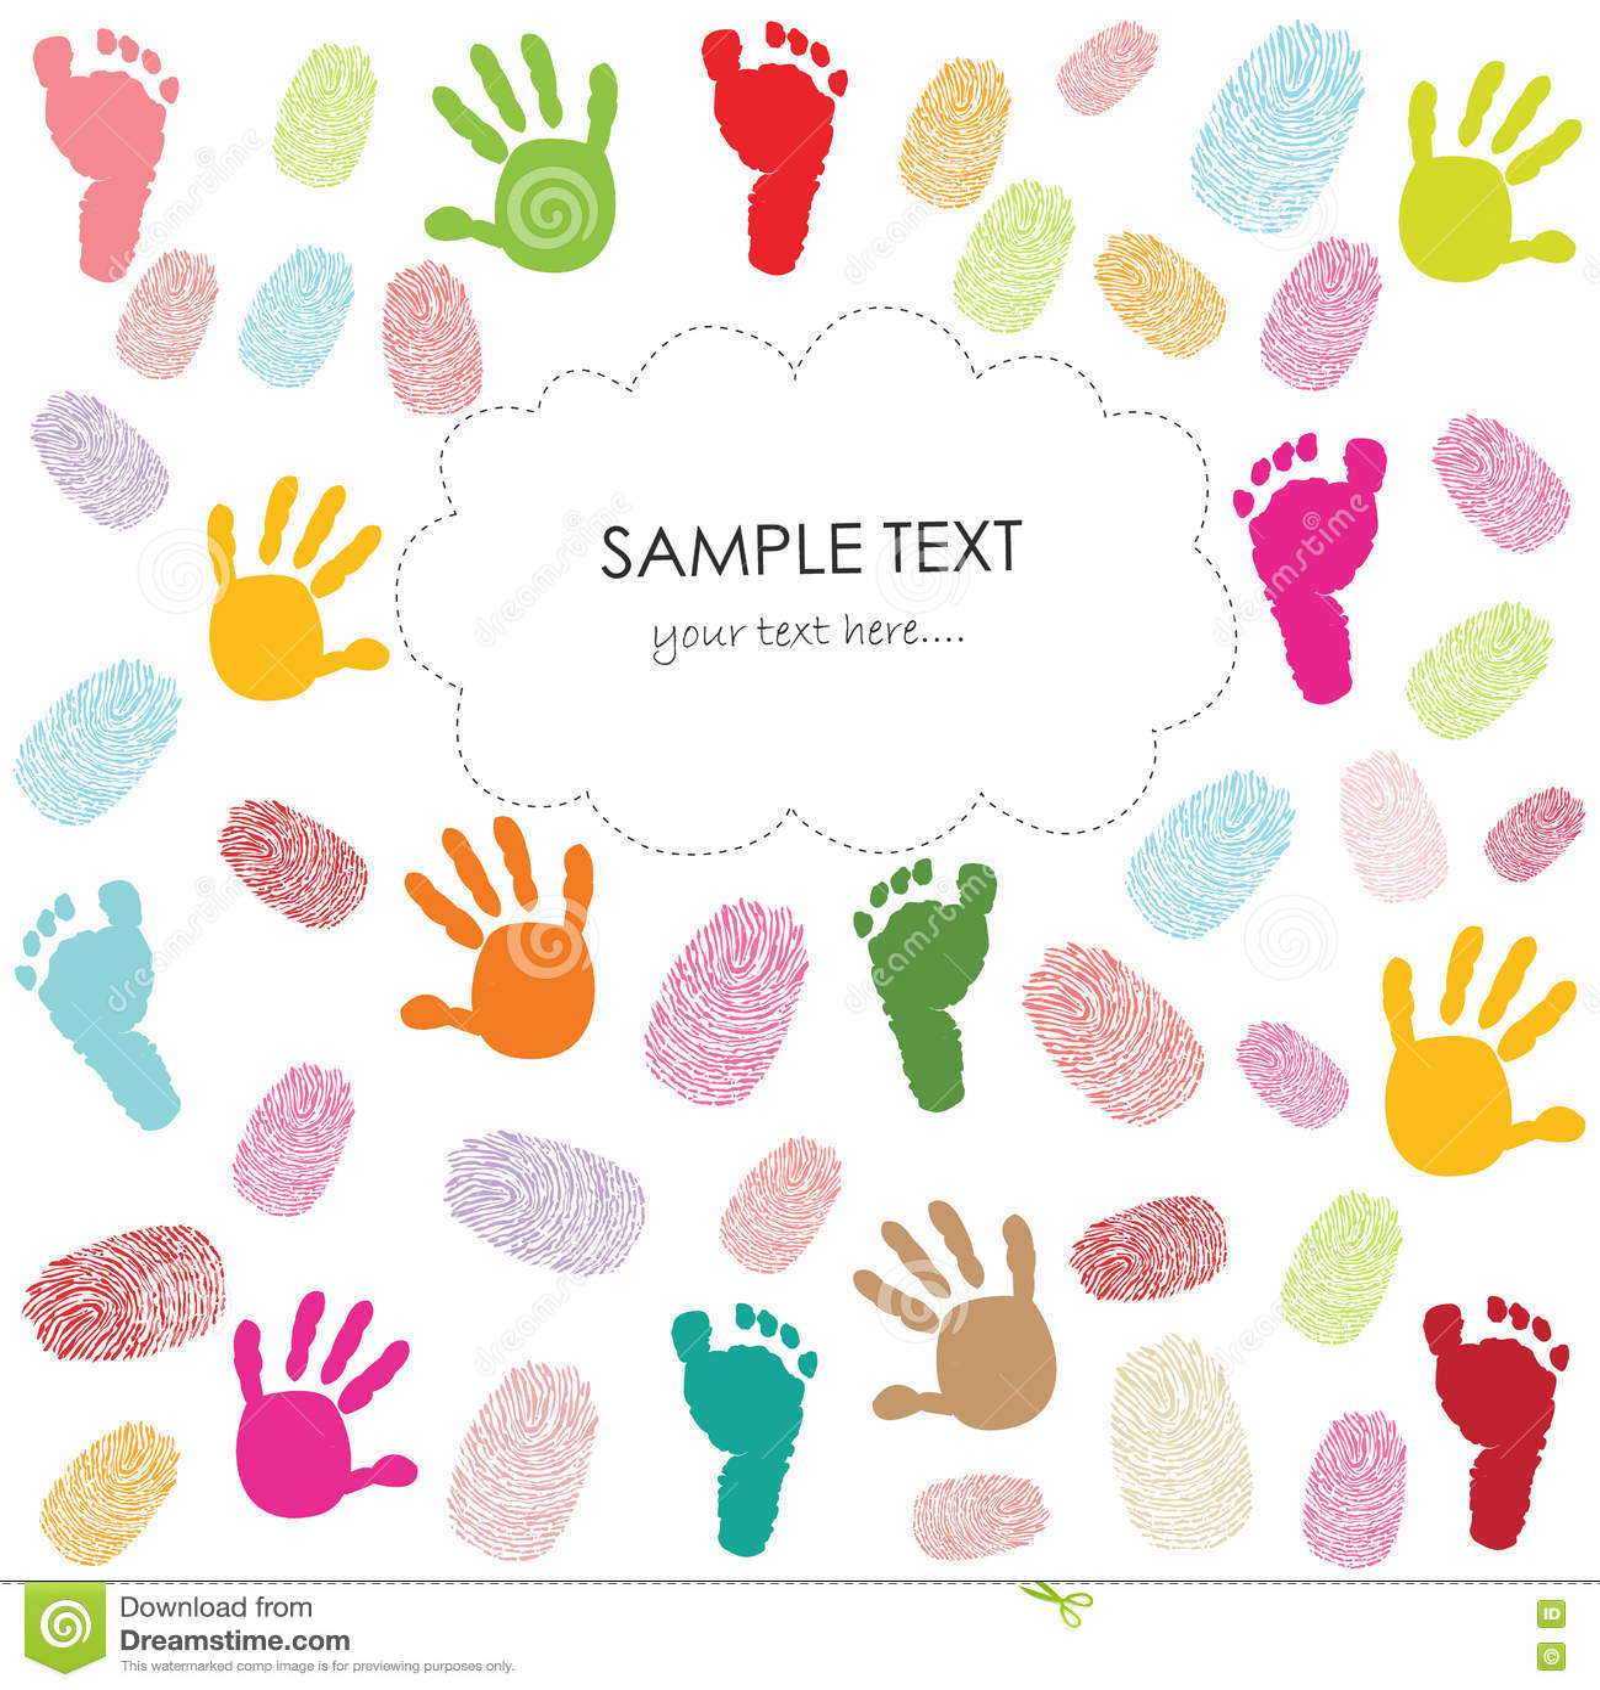 Baby footprint, hand prints and finger prints kids greeting card vector illustration